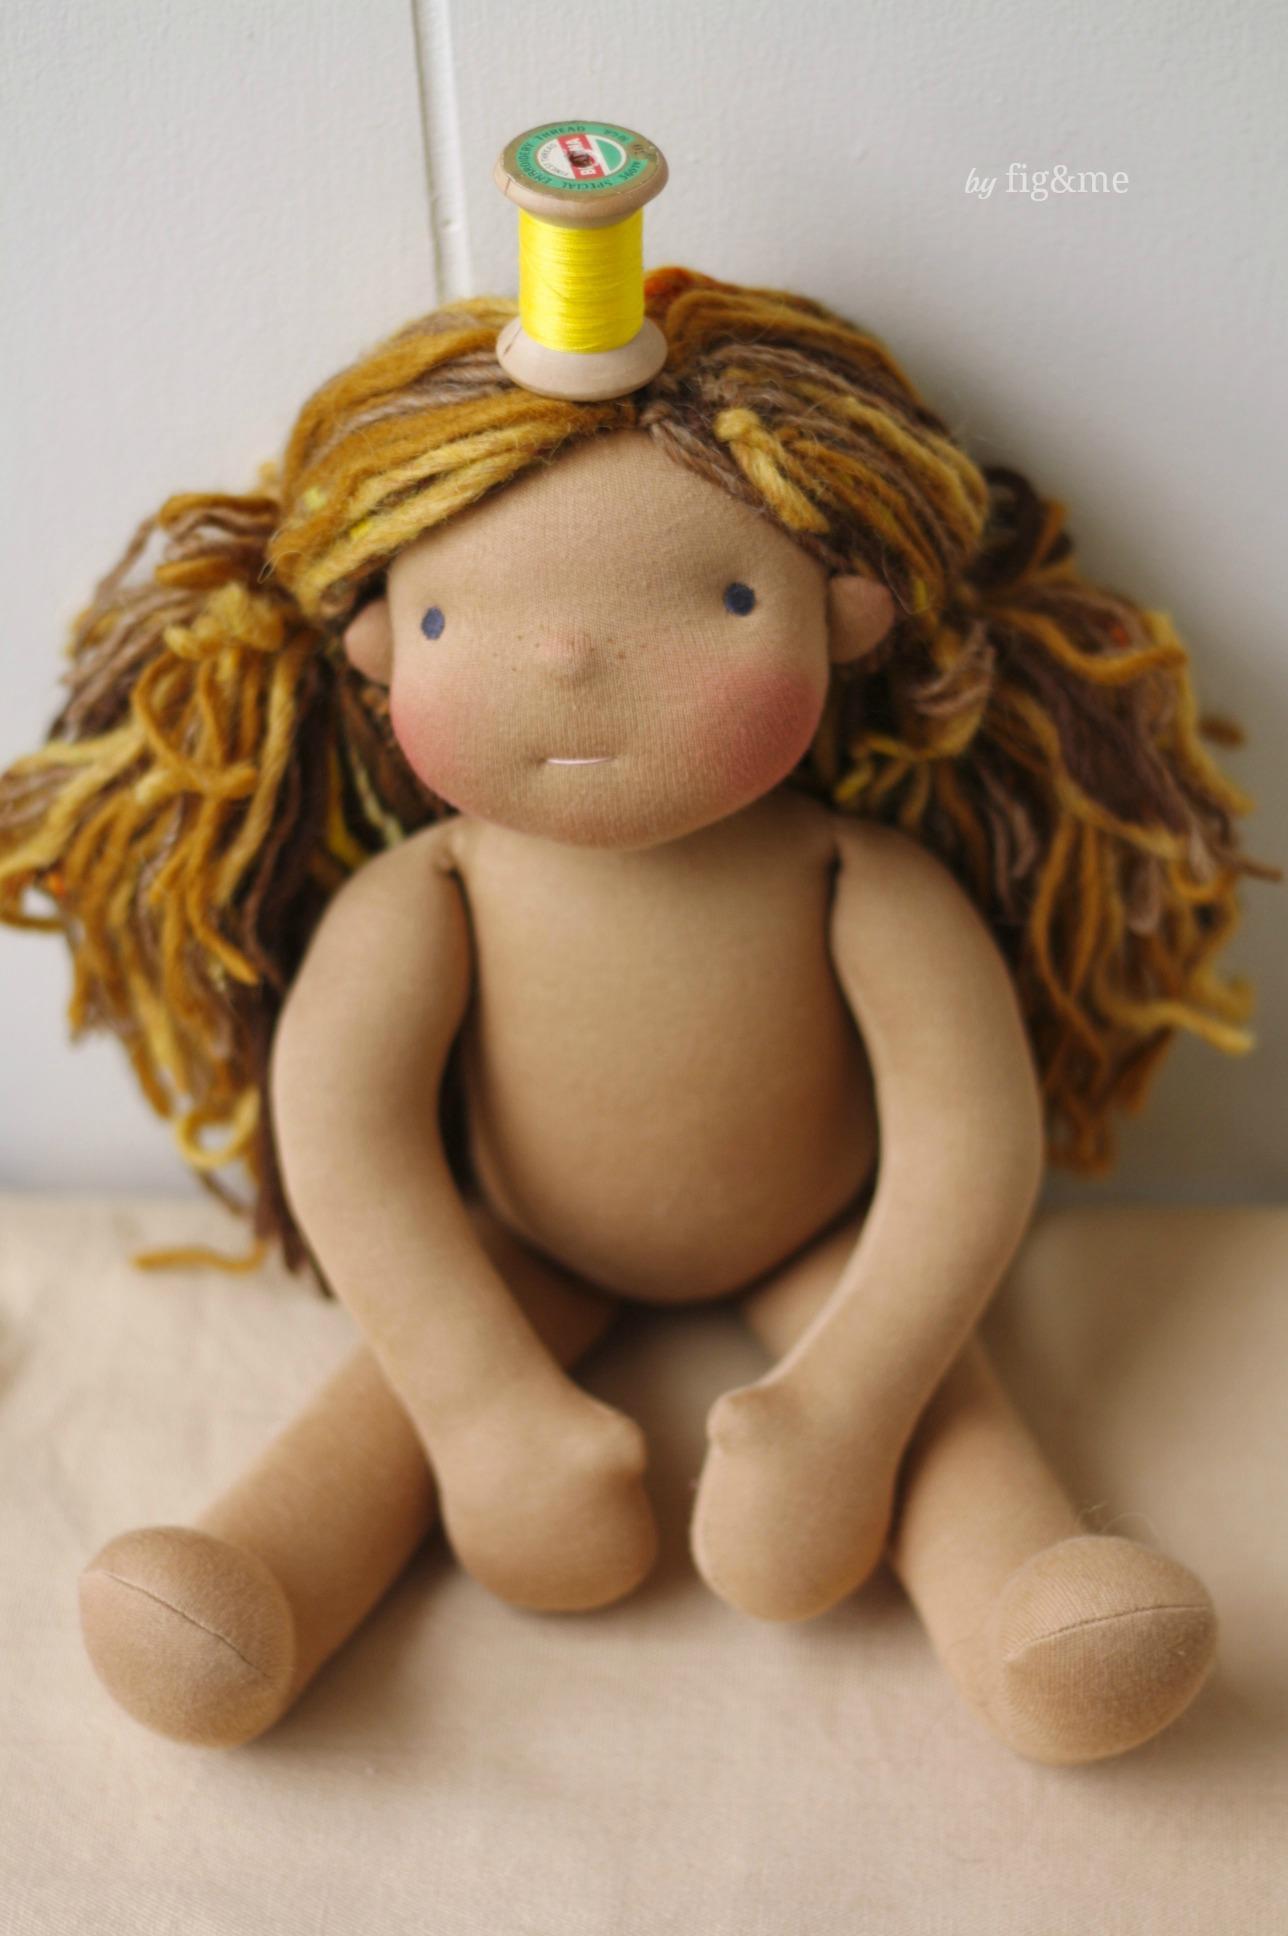 Lottie wearing a yellow spool of thread, by Fig&me